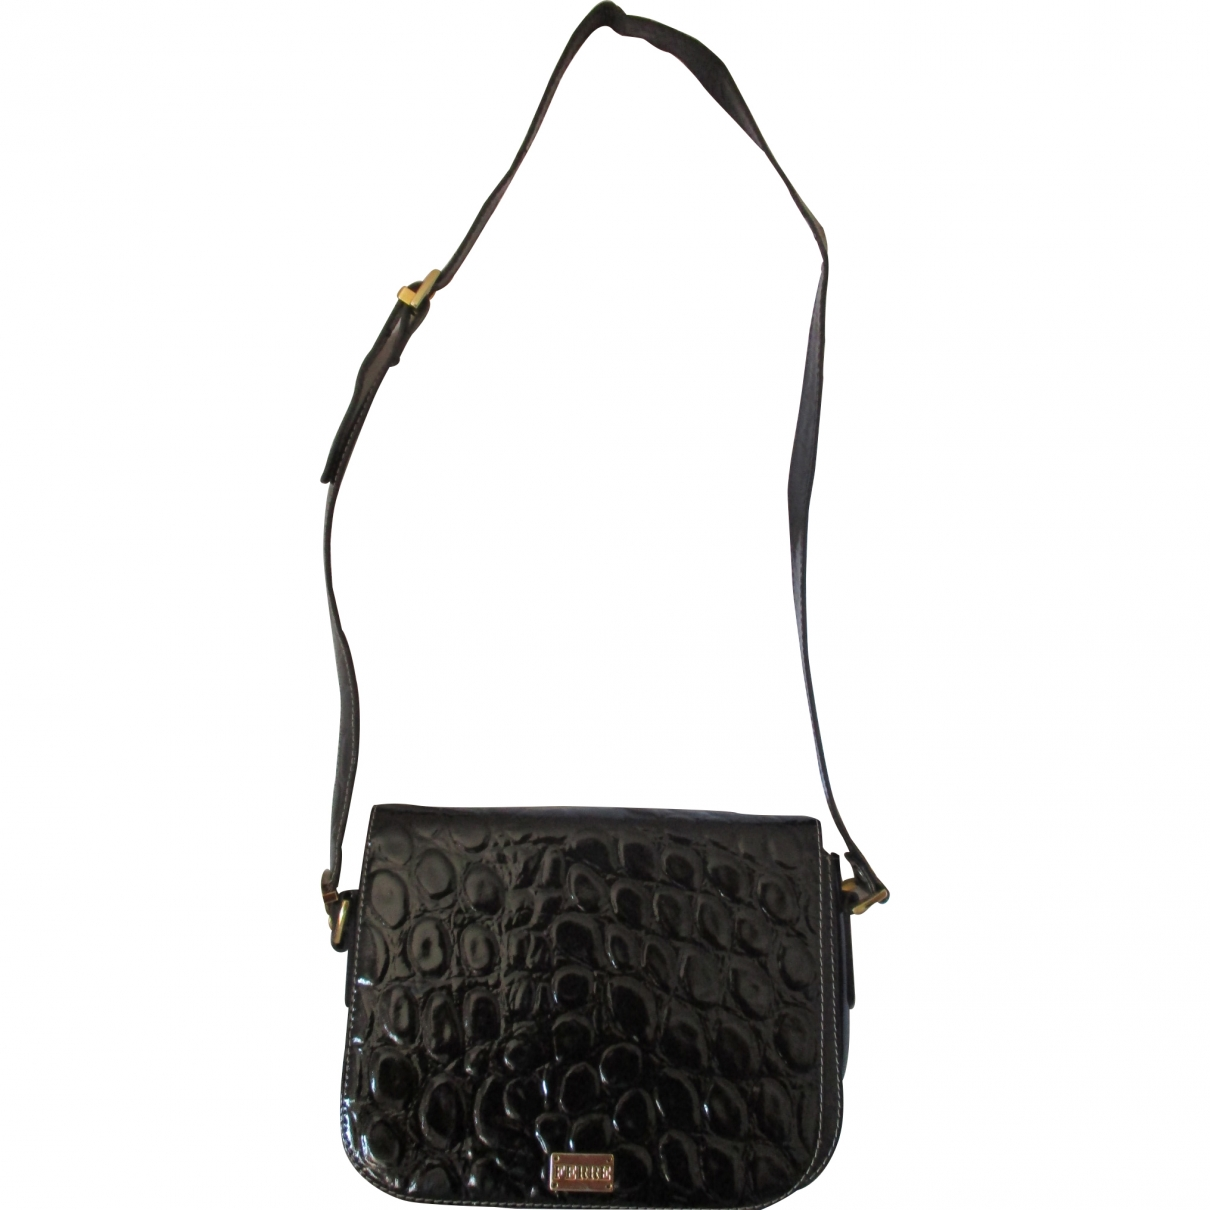 Gianfranco Ferré \N Black Leather handbag for Women \N